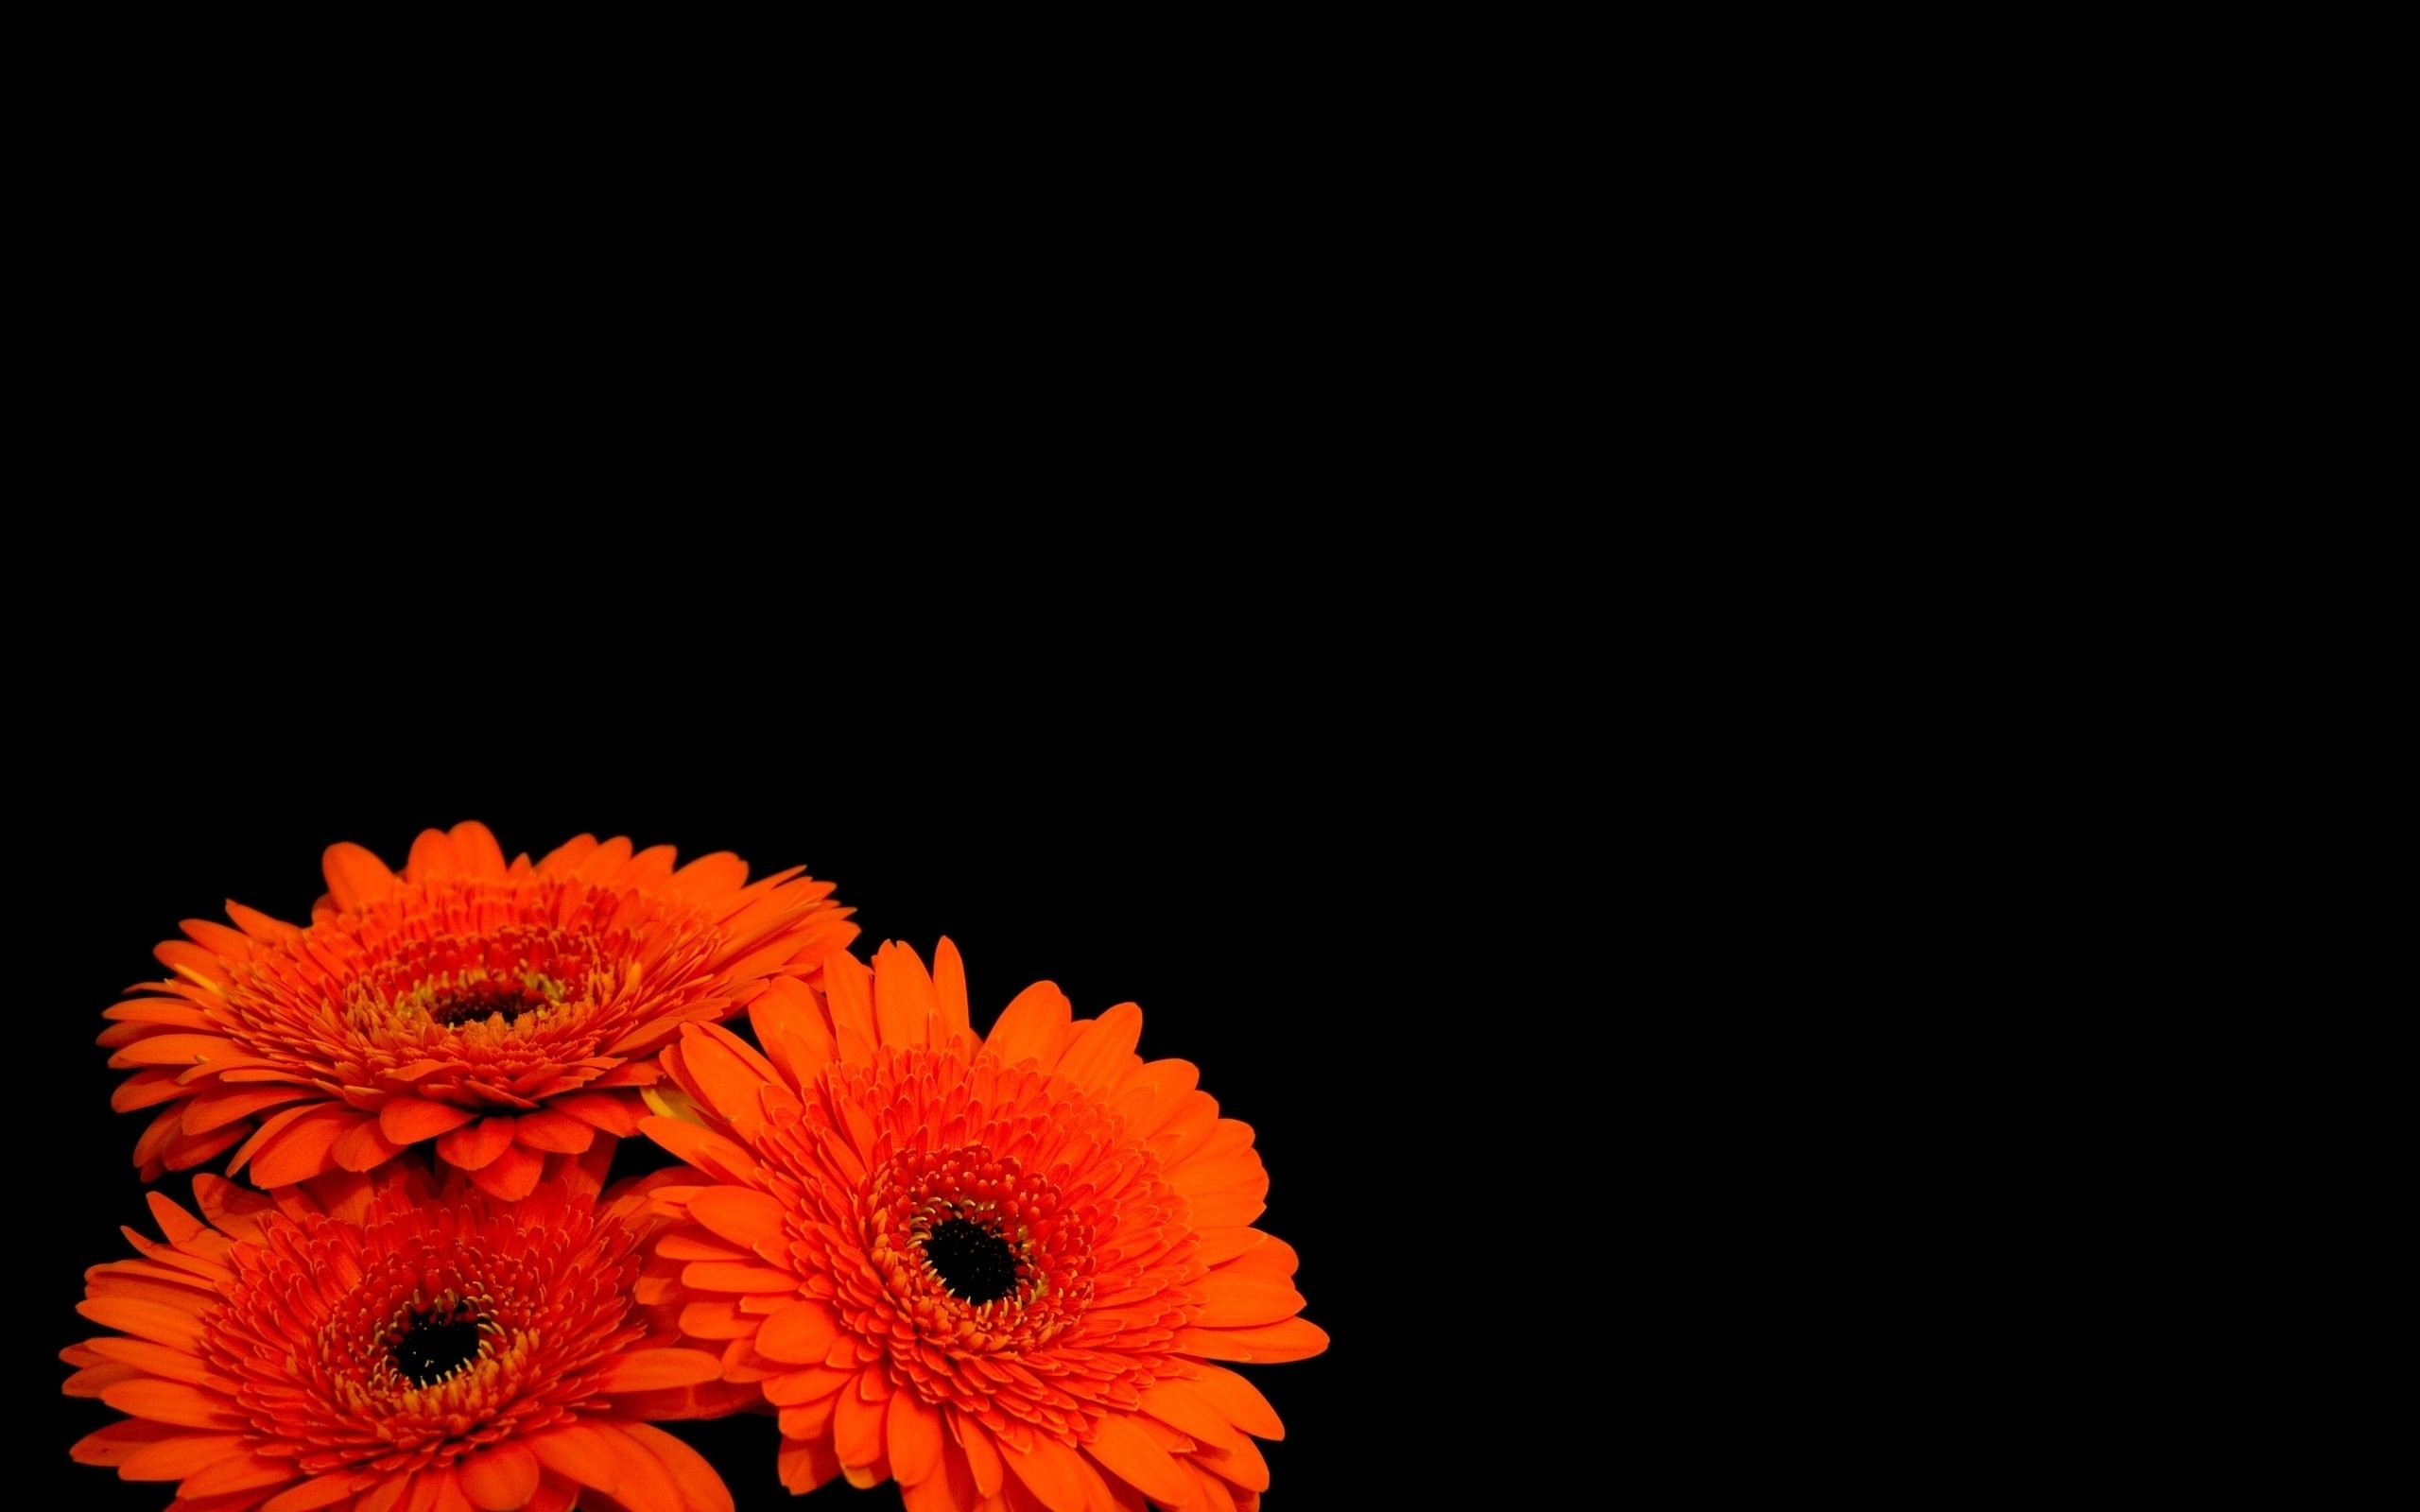 Black Background Wallpaper With Flowers Wallpapersafari